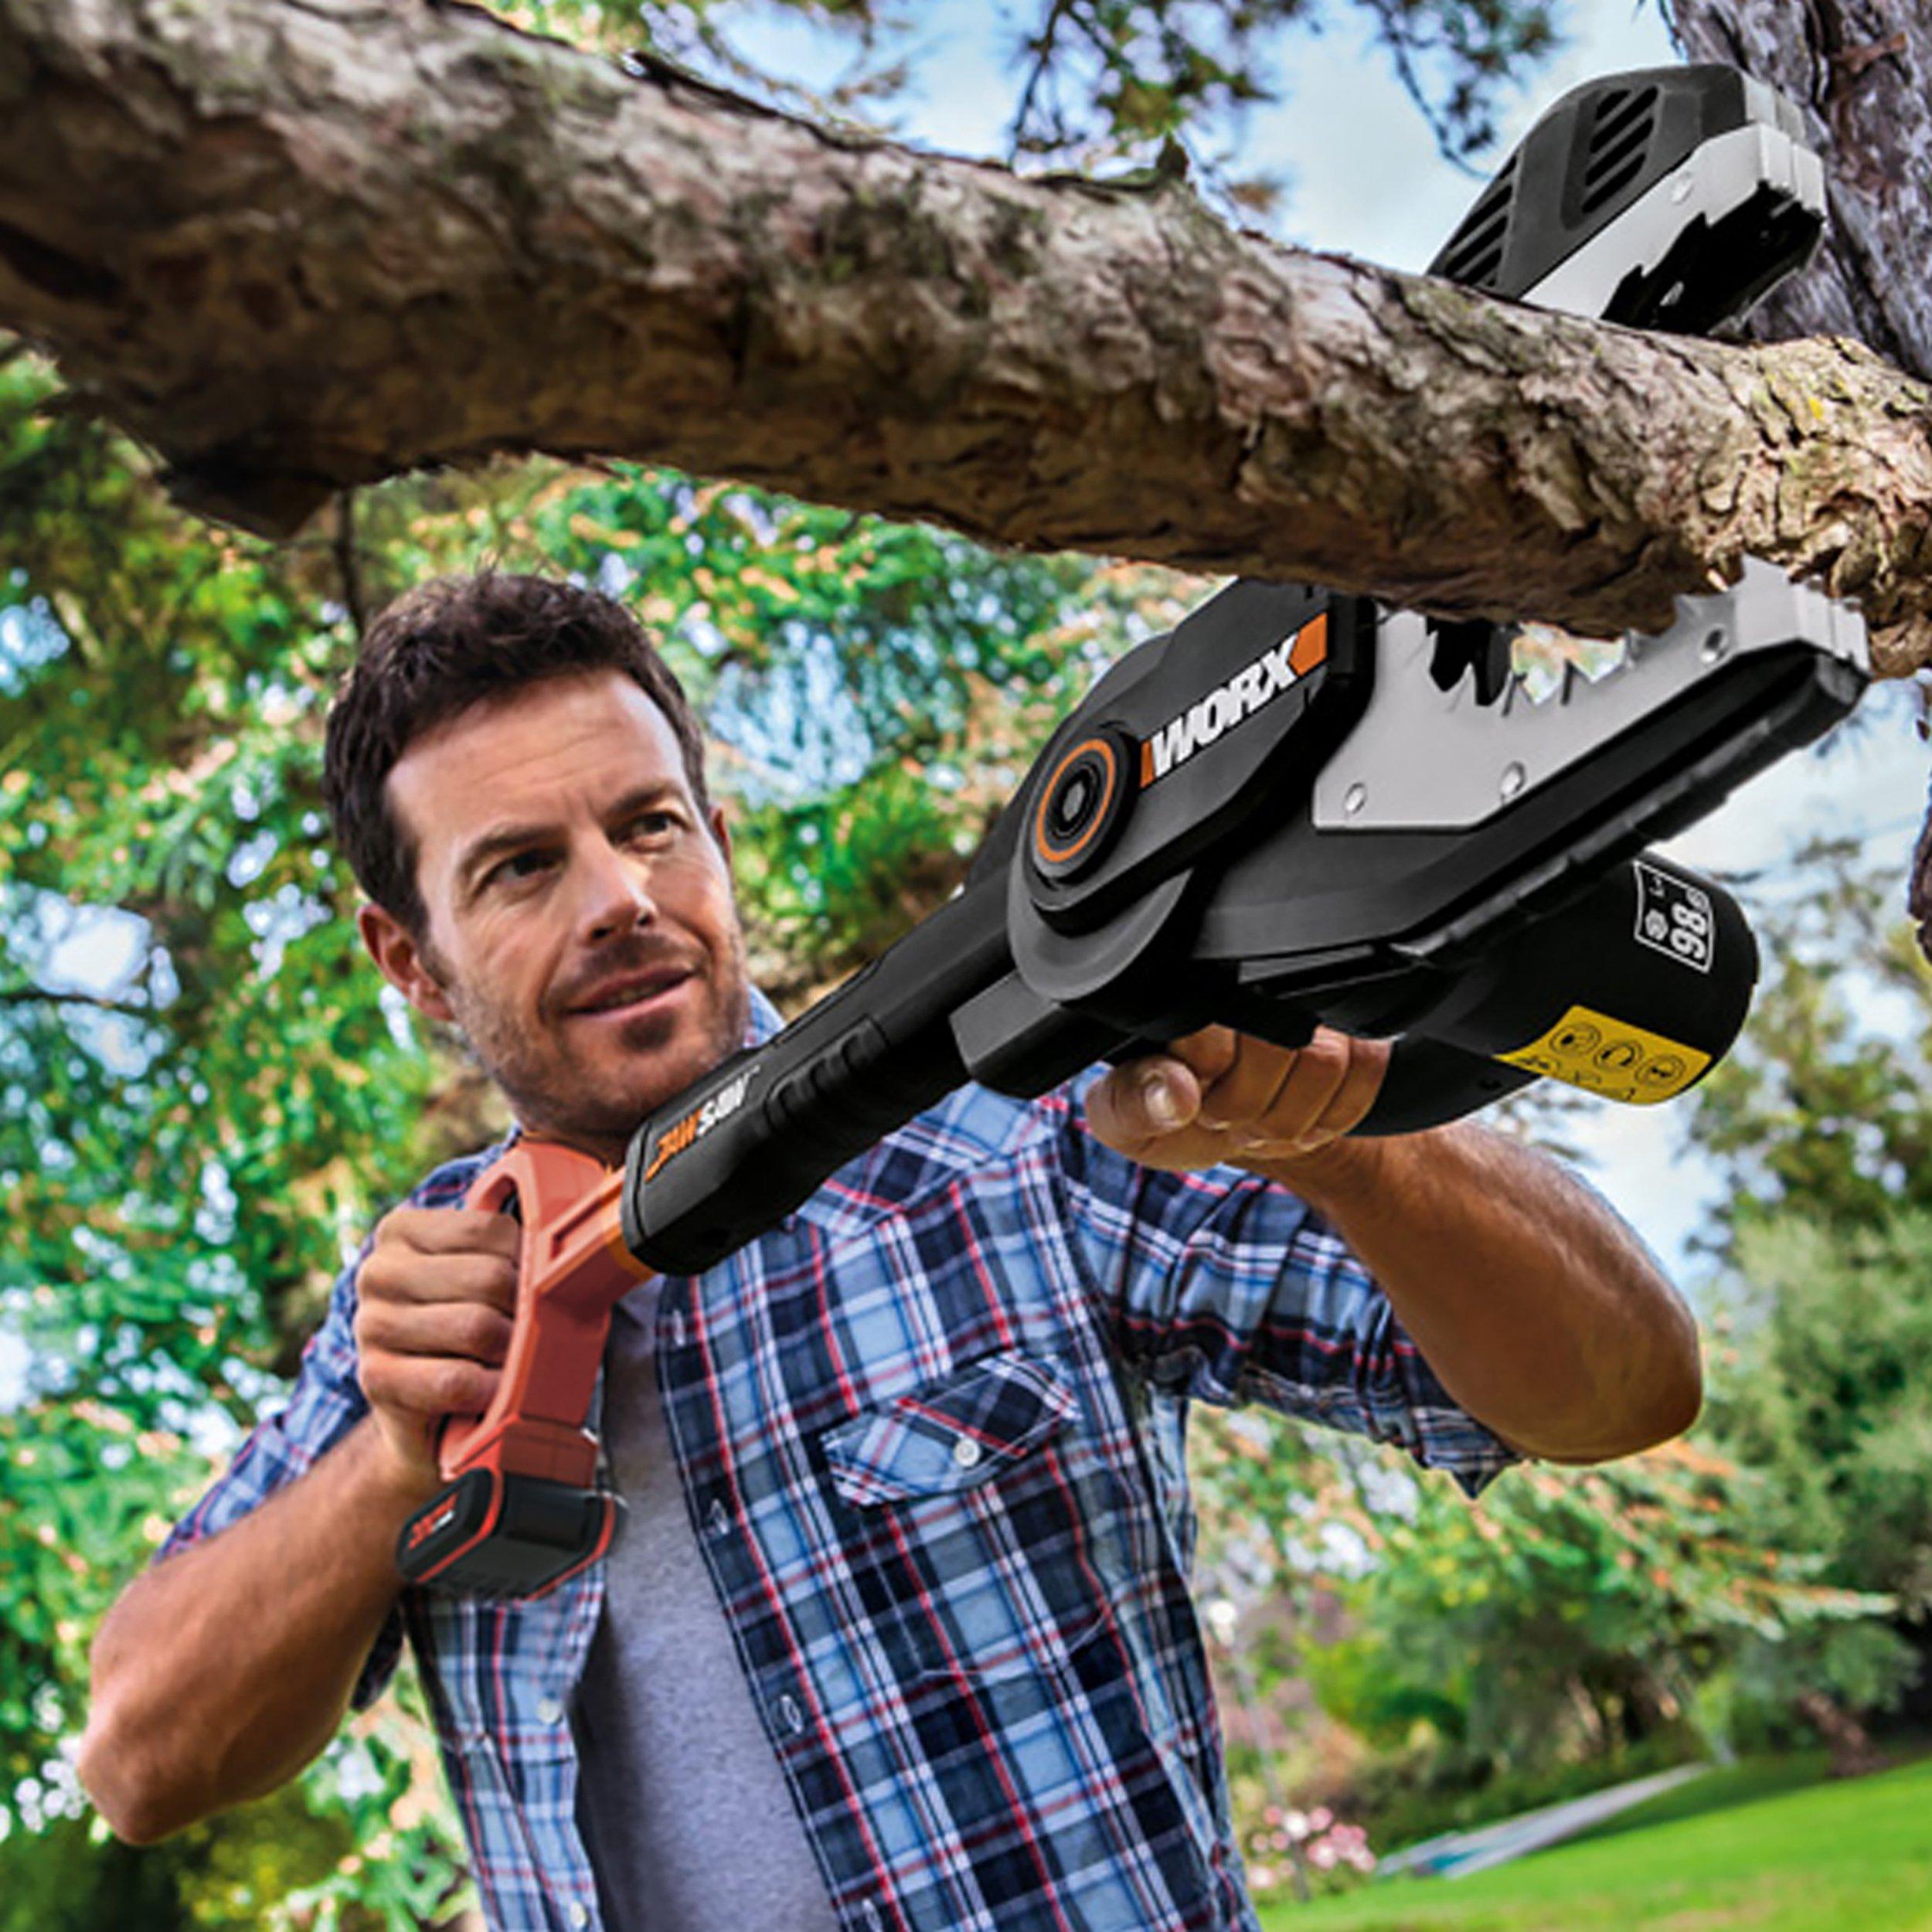 Worx WG329E.9 20V Astsäge Jawsaw, ohne Akku, Mann sägt Ast am Baum